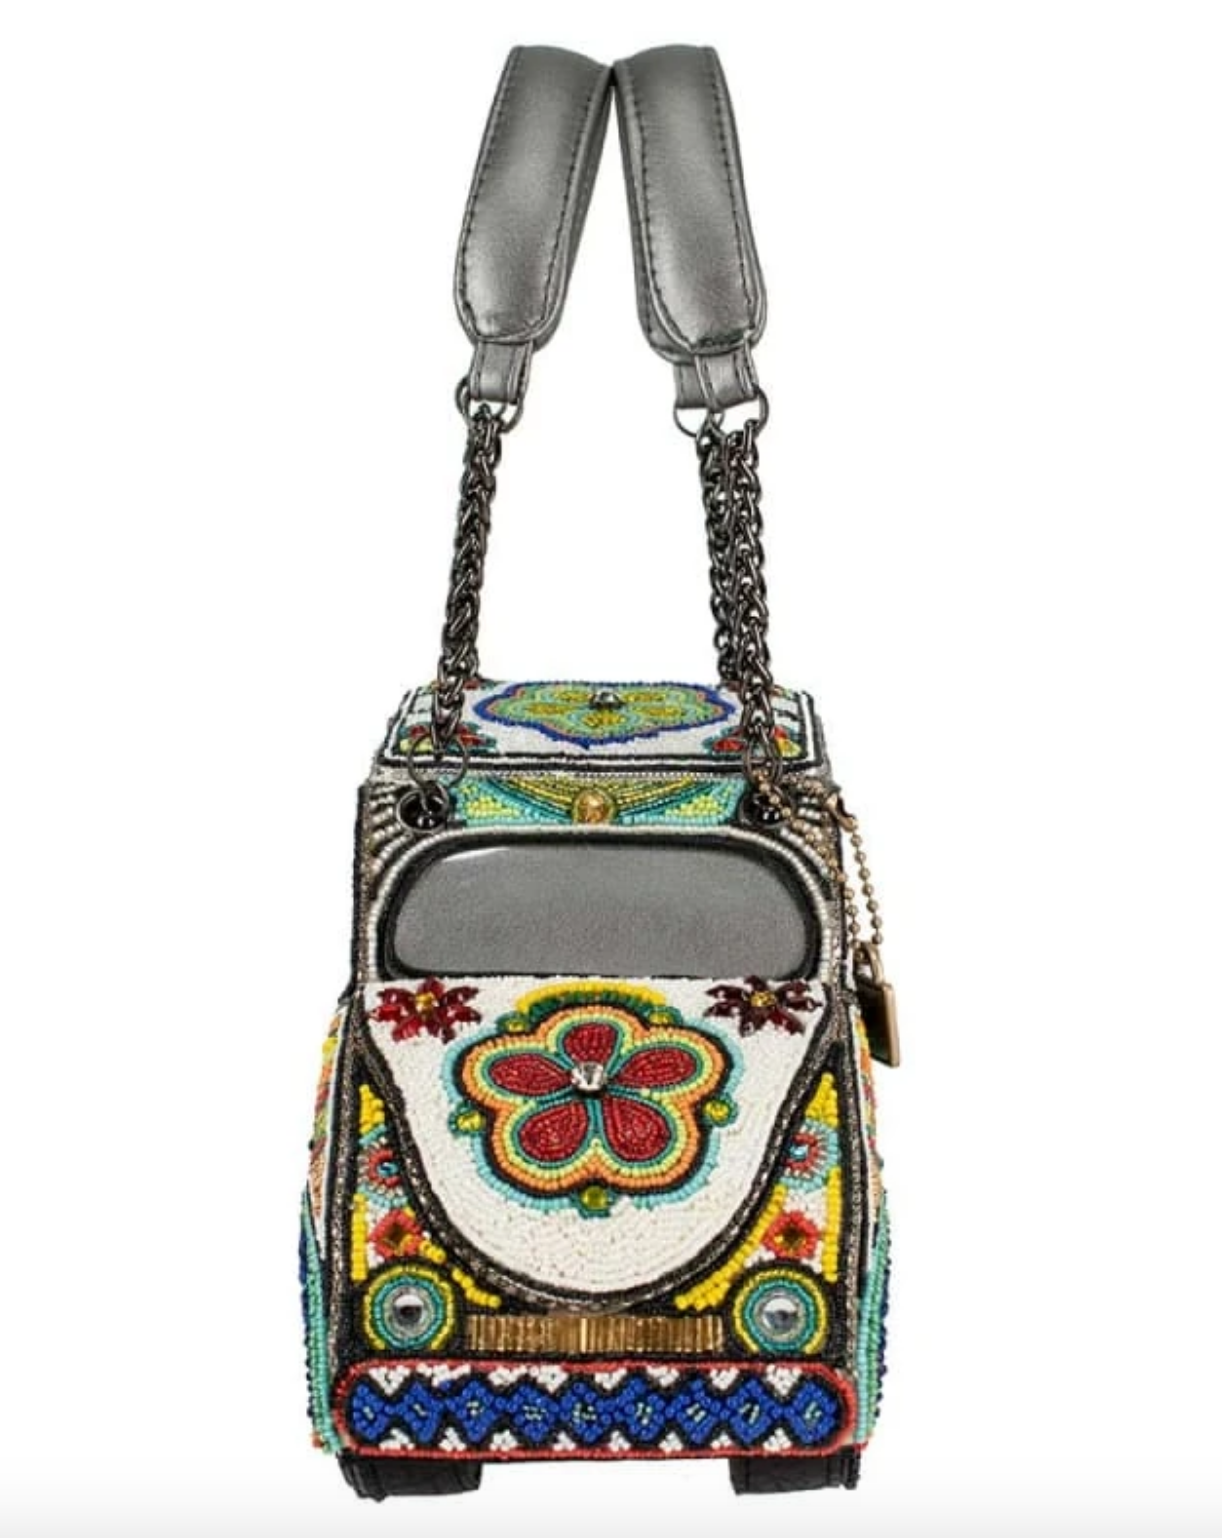 Mary Frances Mary Frances - Drive Me Crazy Handbag